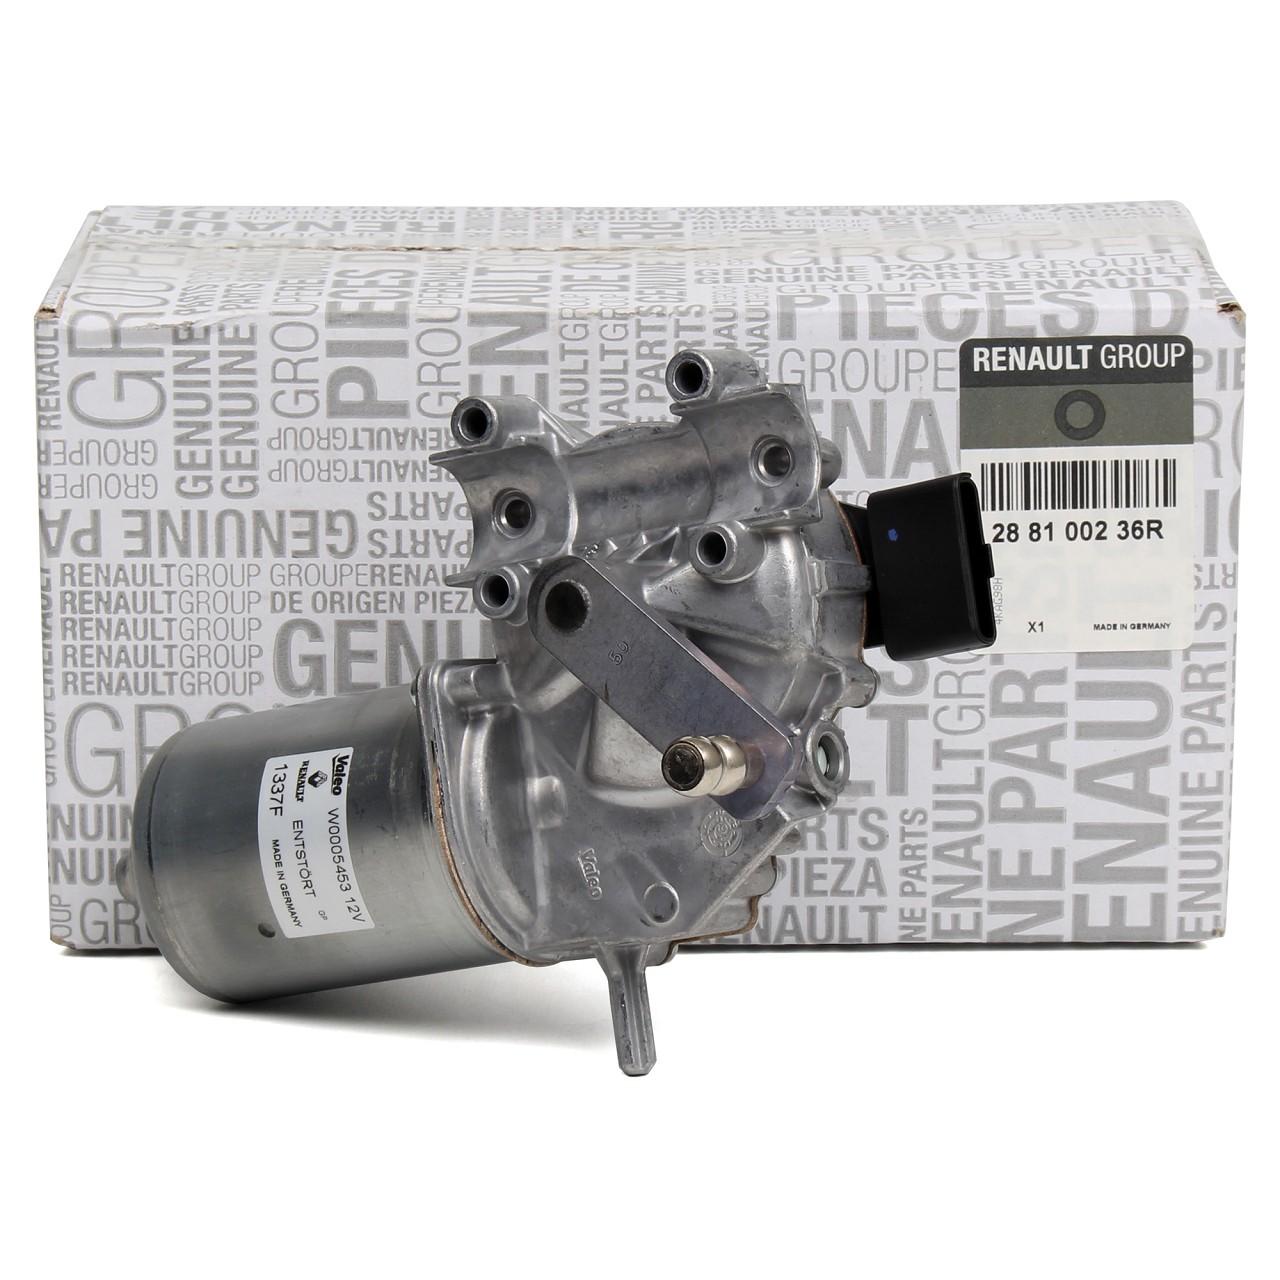 ORIGINAL Renault Wischermotor Frontwischermotor MASTER III vorne 288100236R